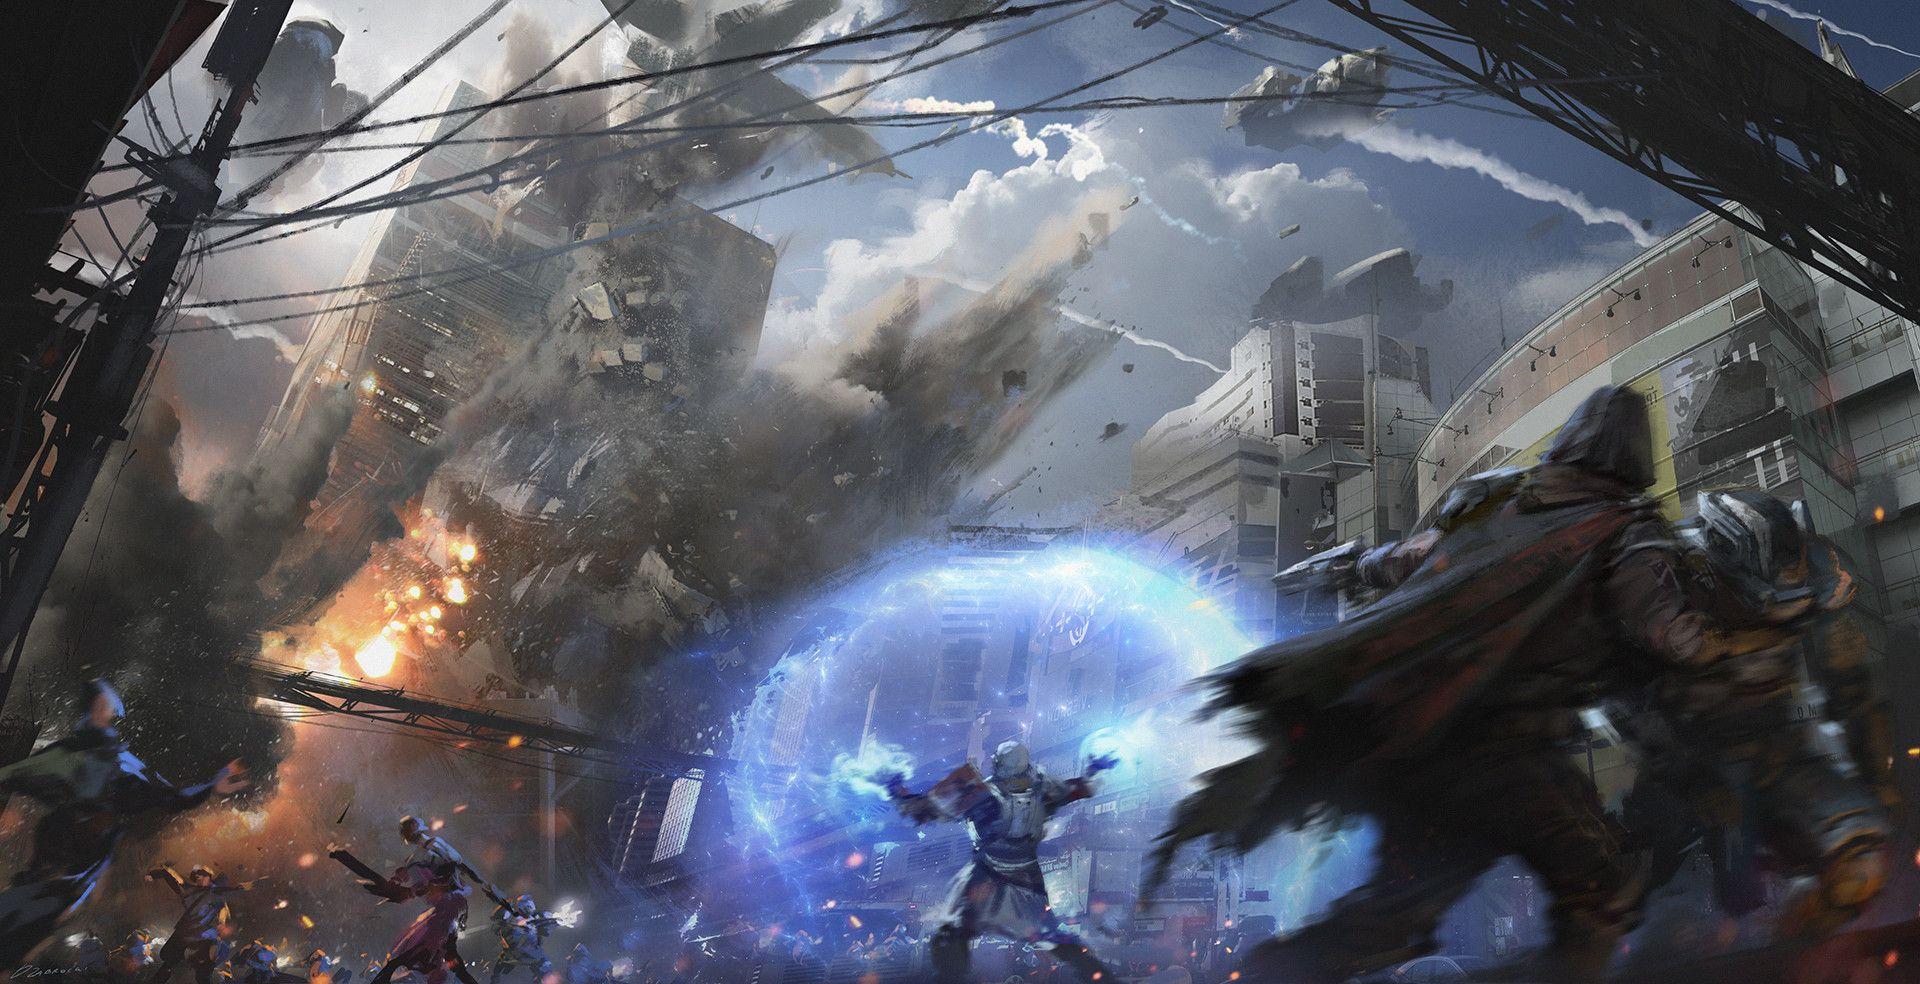 ArtStation - Destiny 2 Cinematic #1 falling tower, Darek